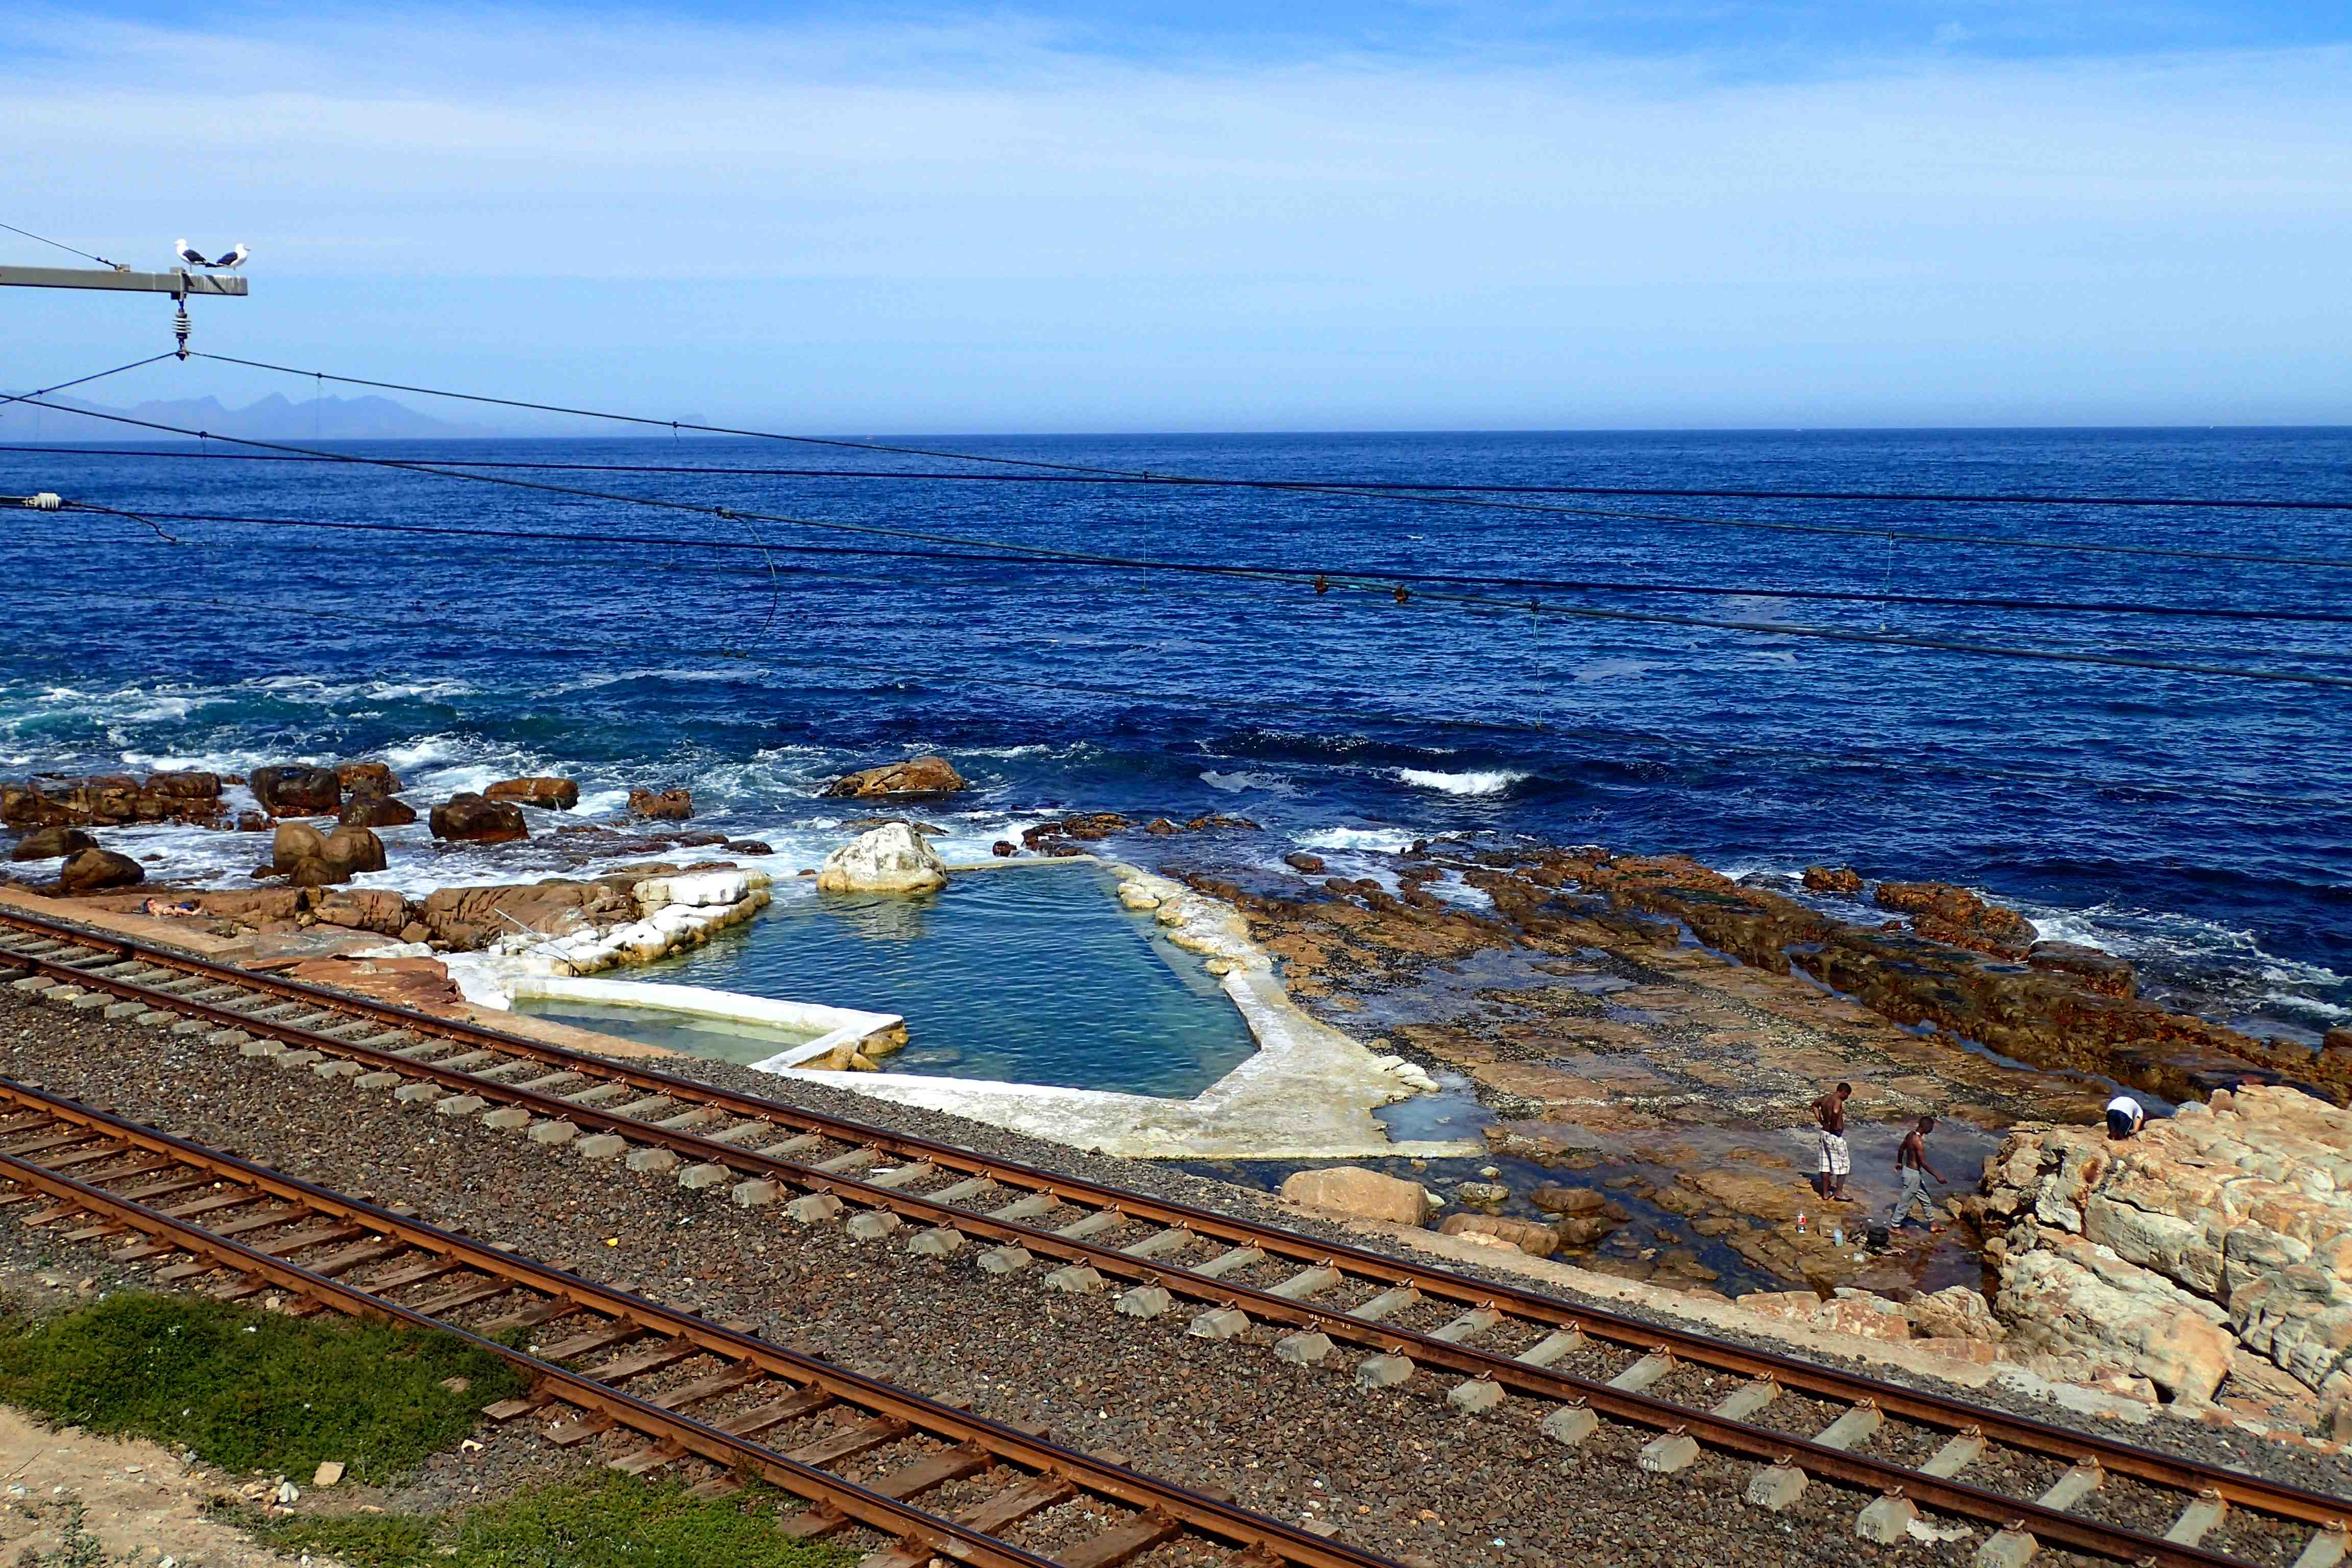 Woolies Pool near Kalk Bay